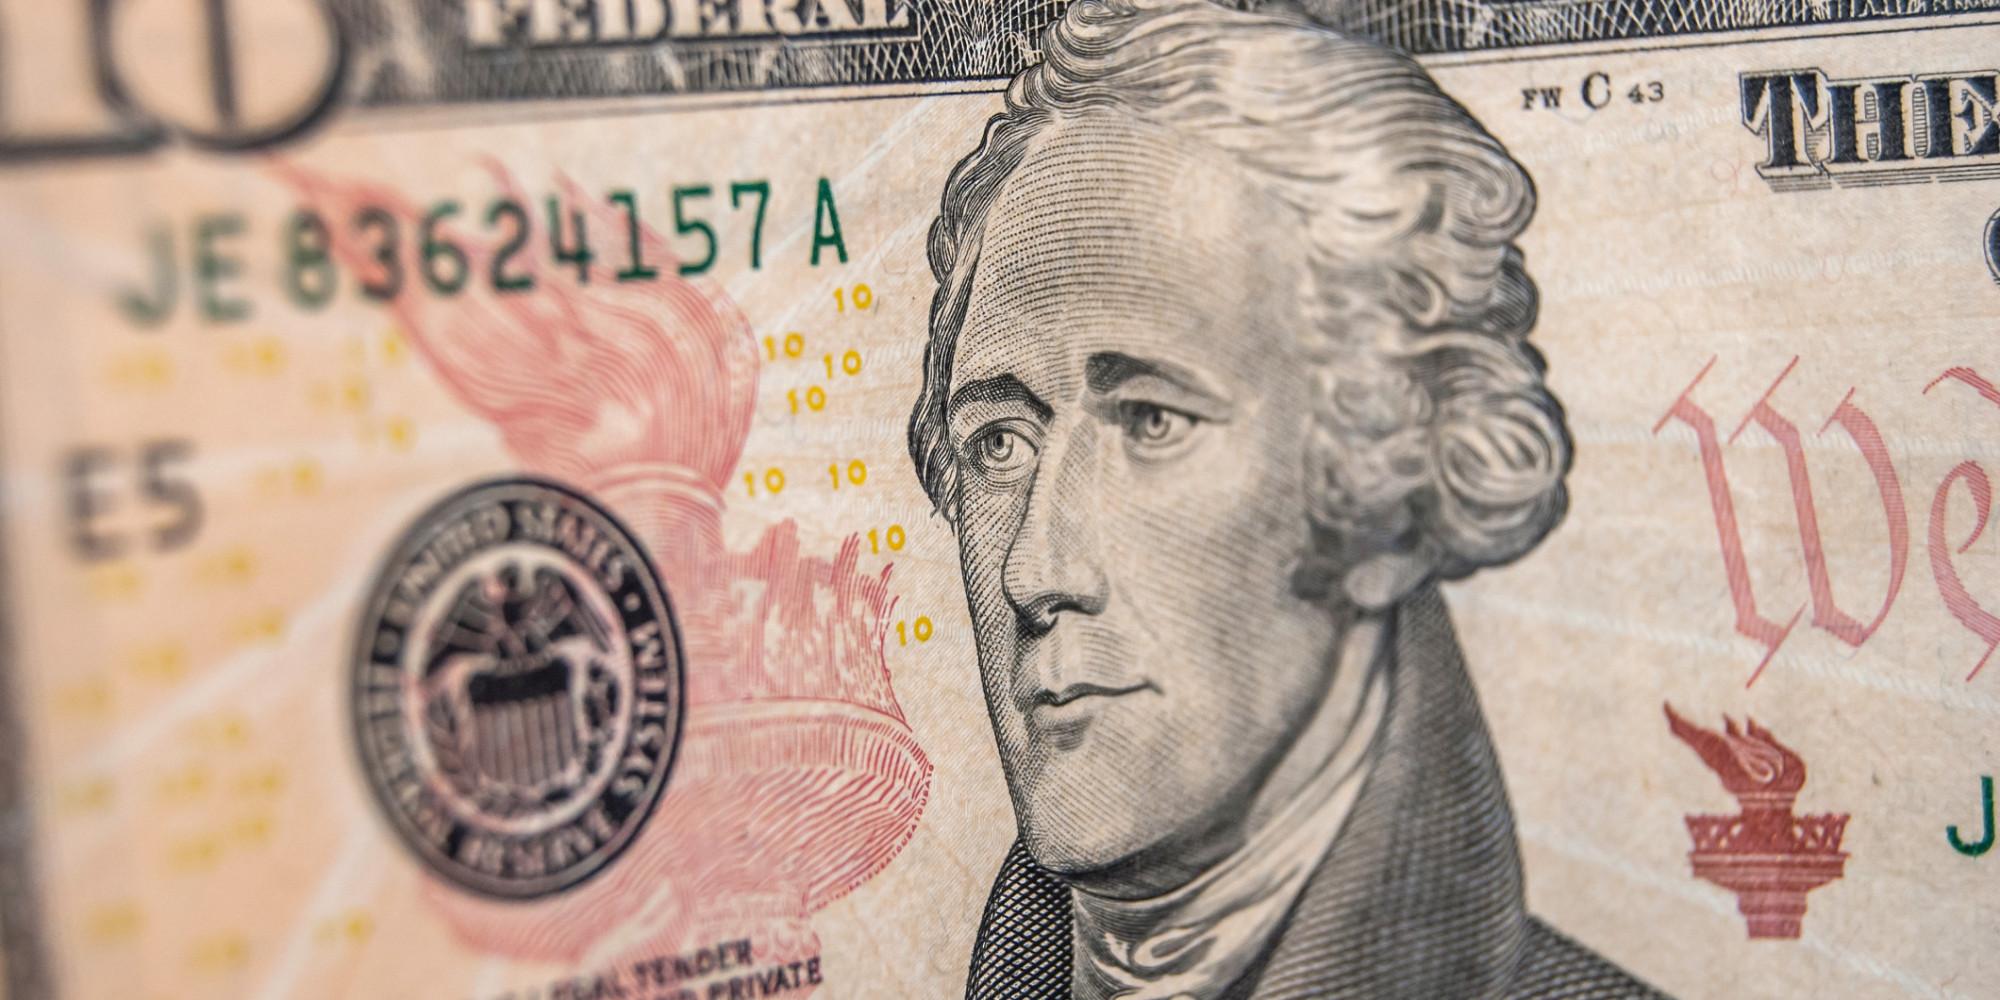 10 dollar com : Hotels in north carolina raleigh